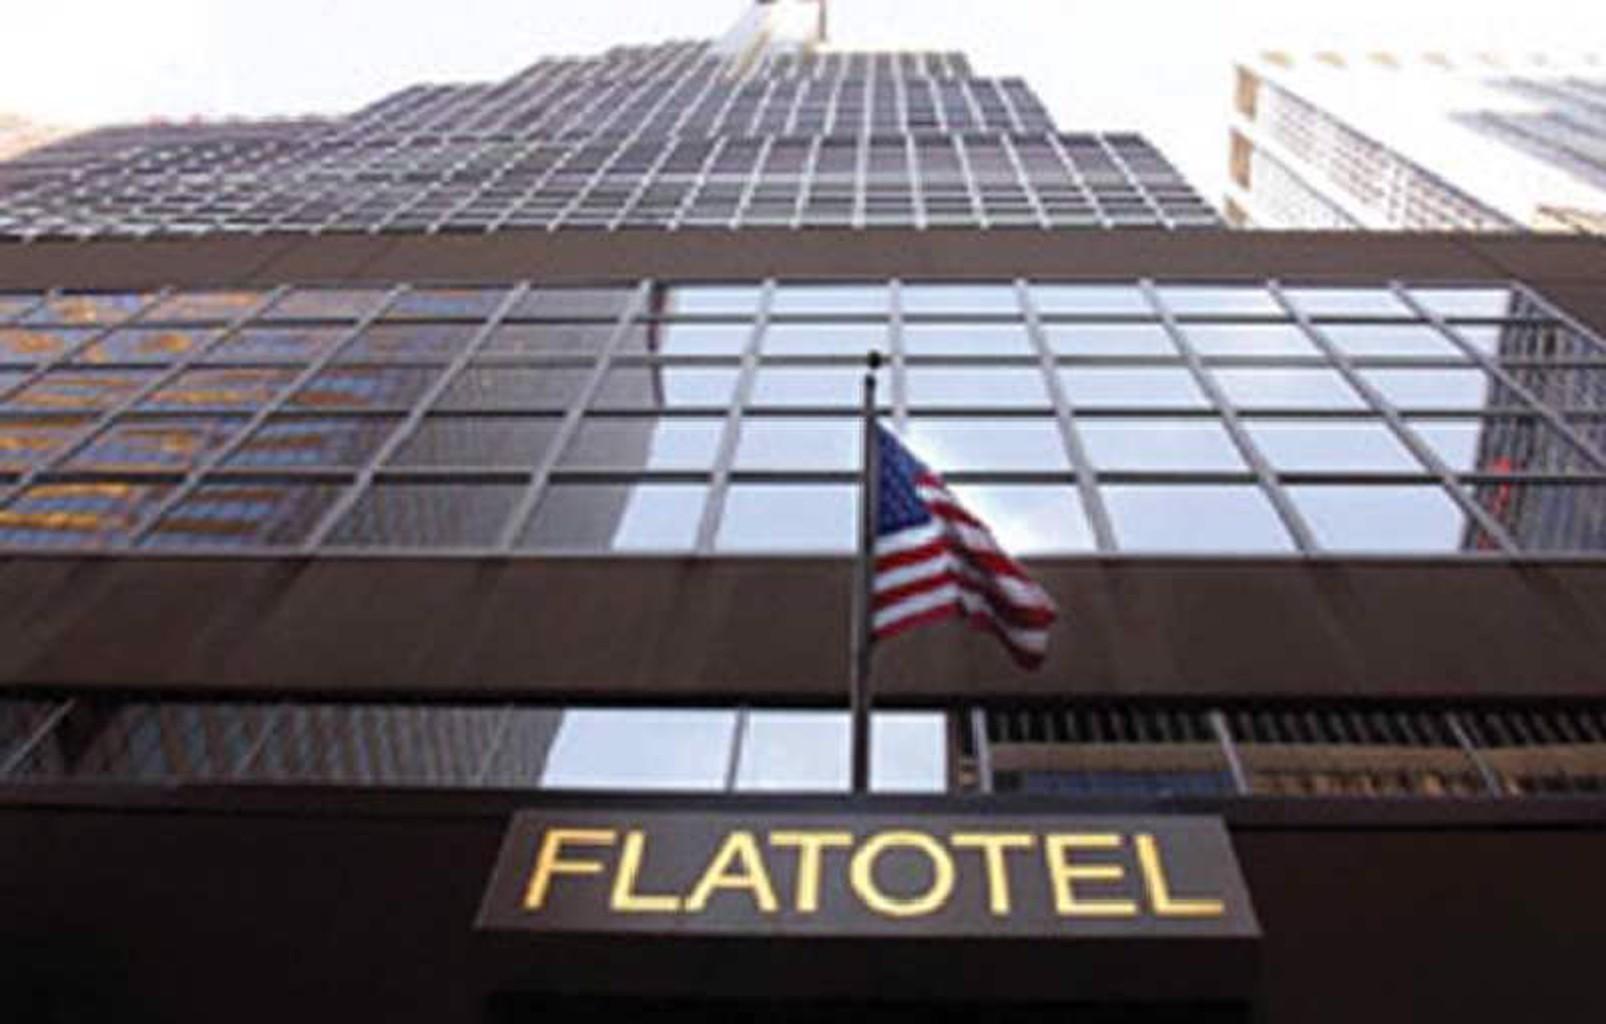 Flatotel New York